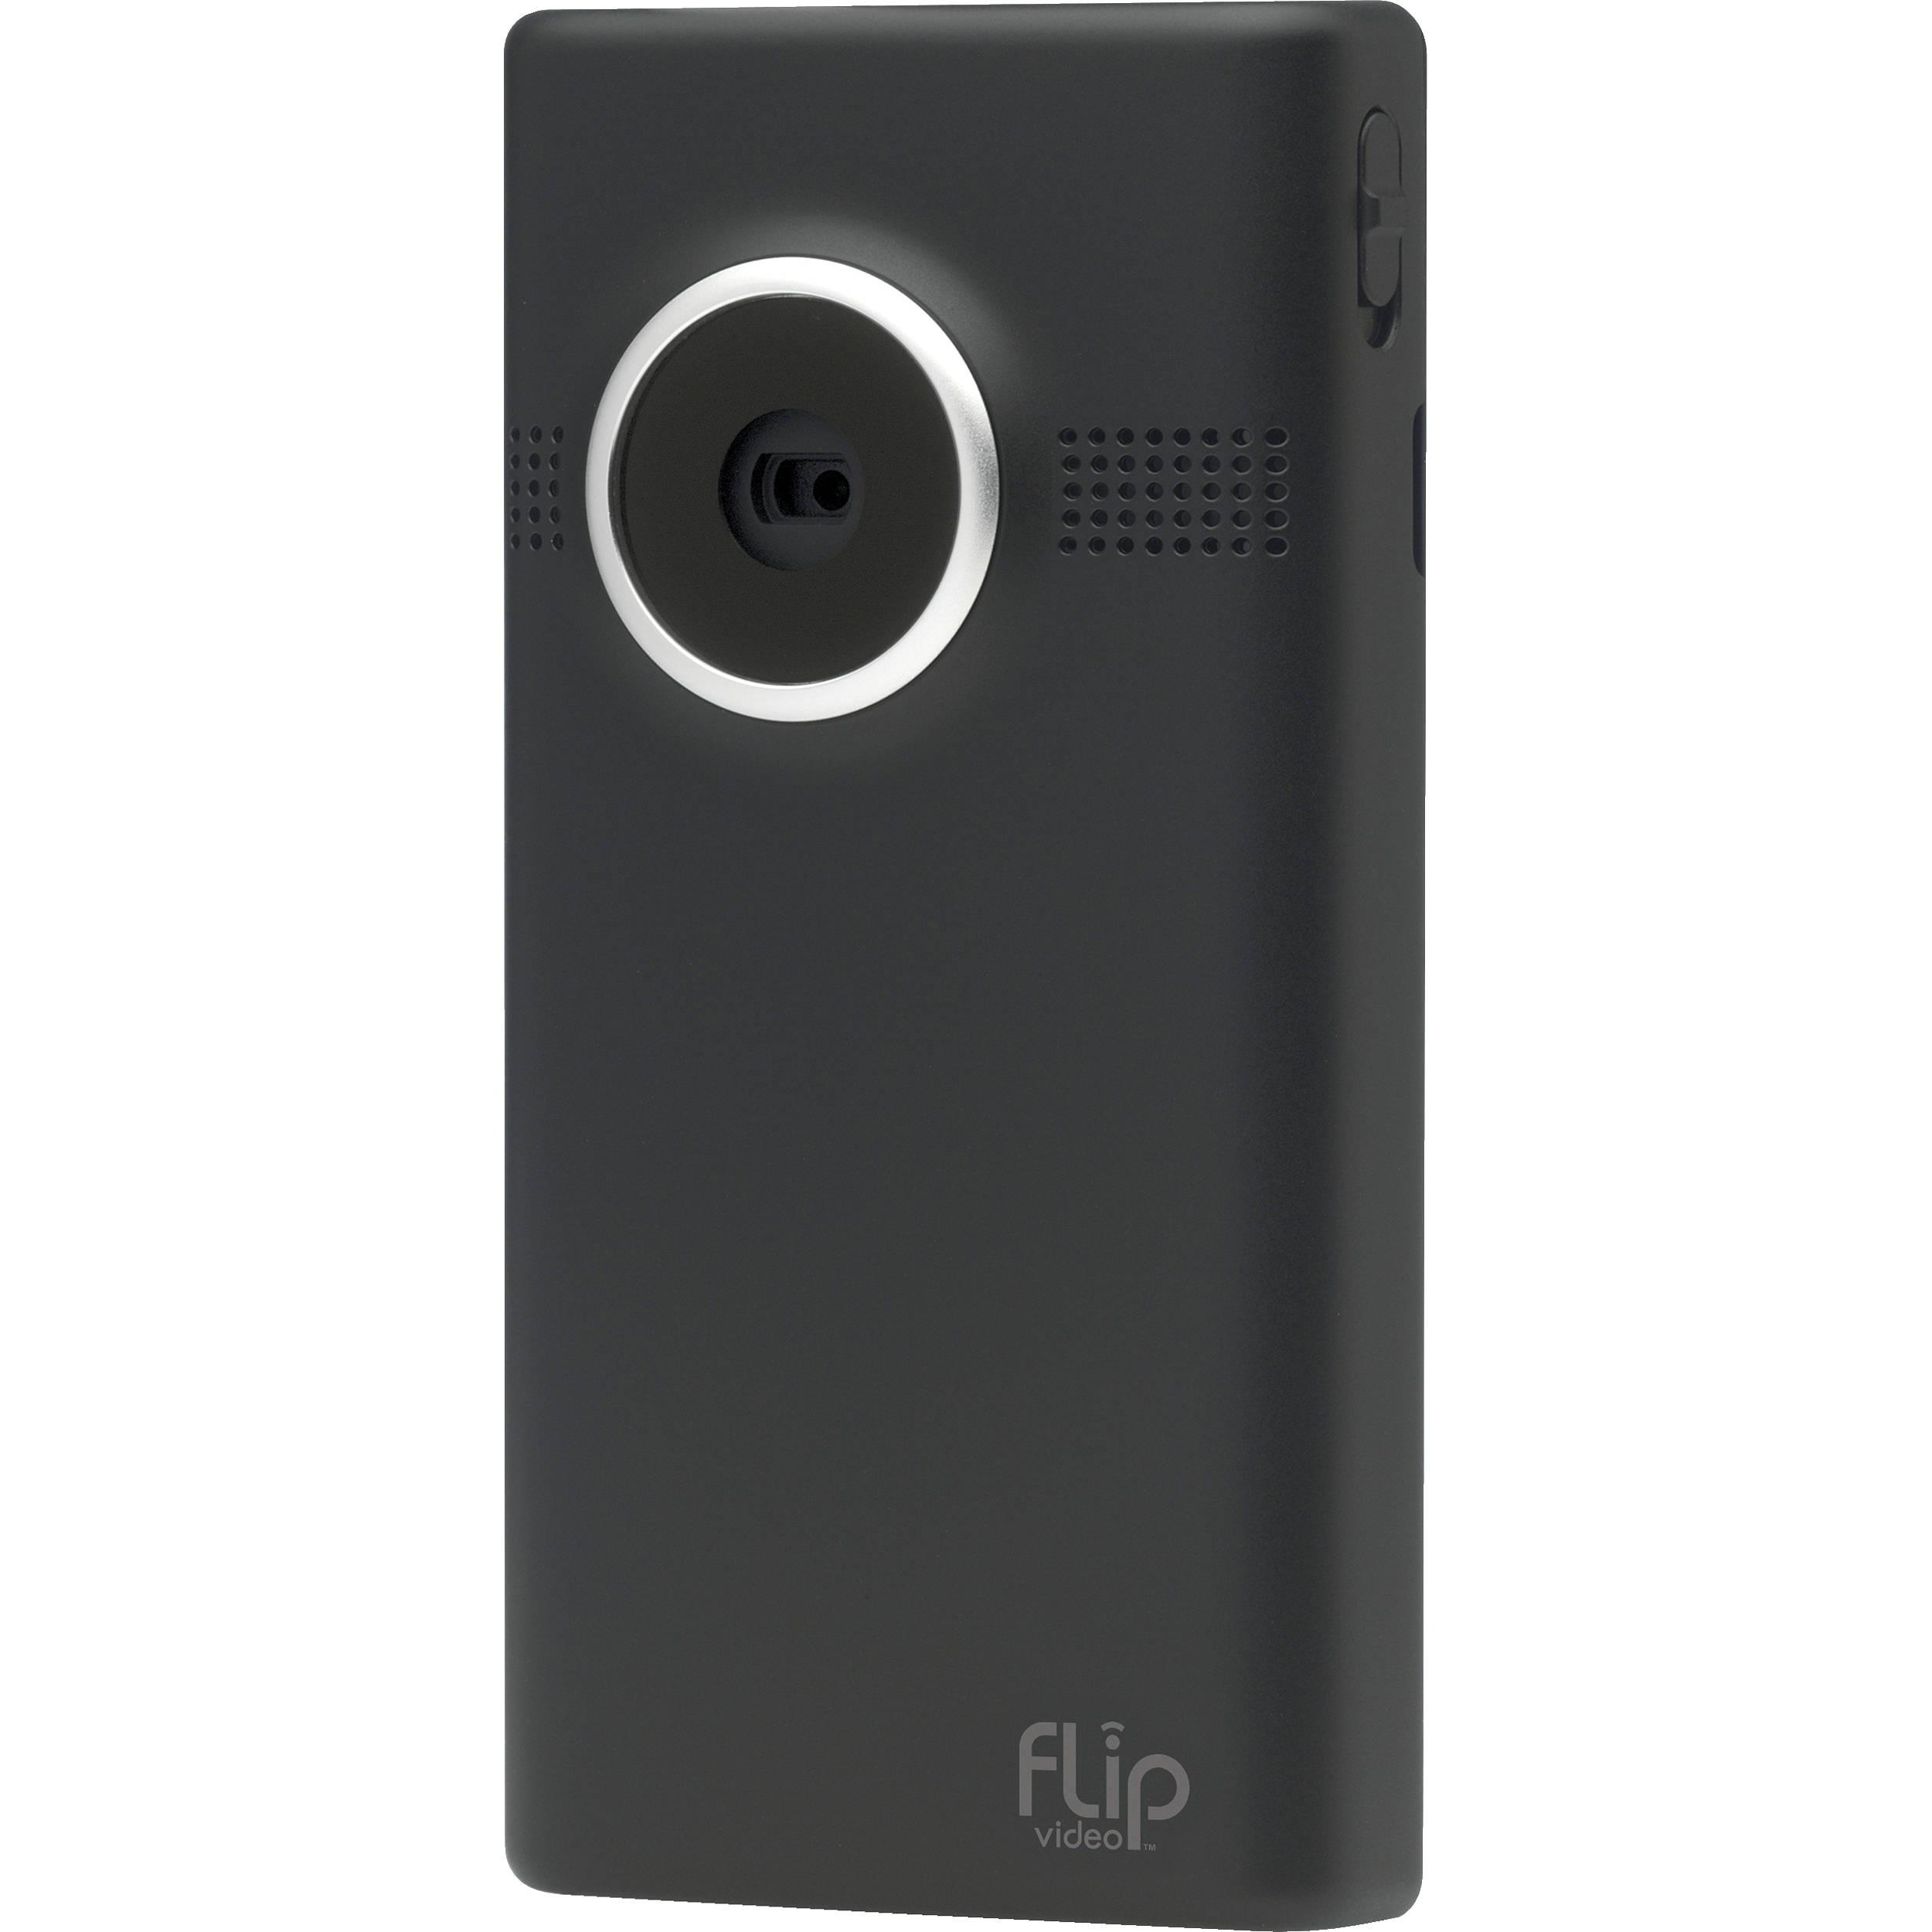 Flip Video MinoHD Video Camera (Black, 2 Hours)